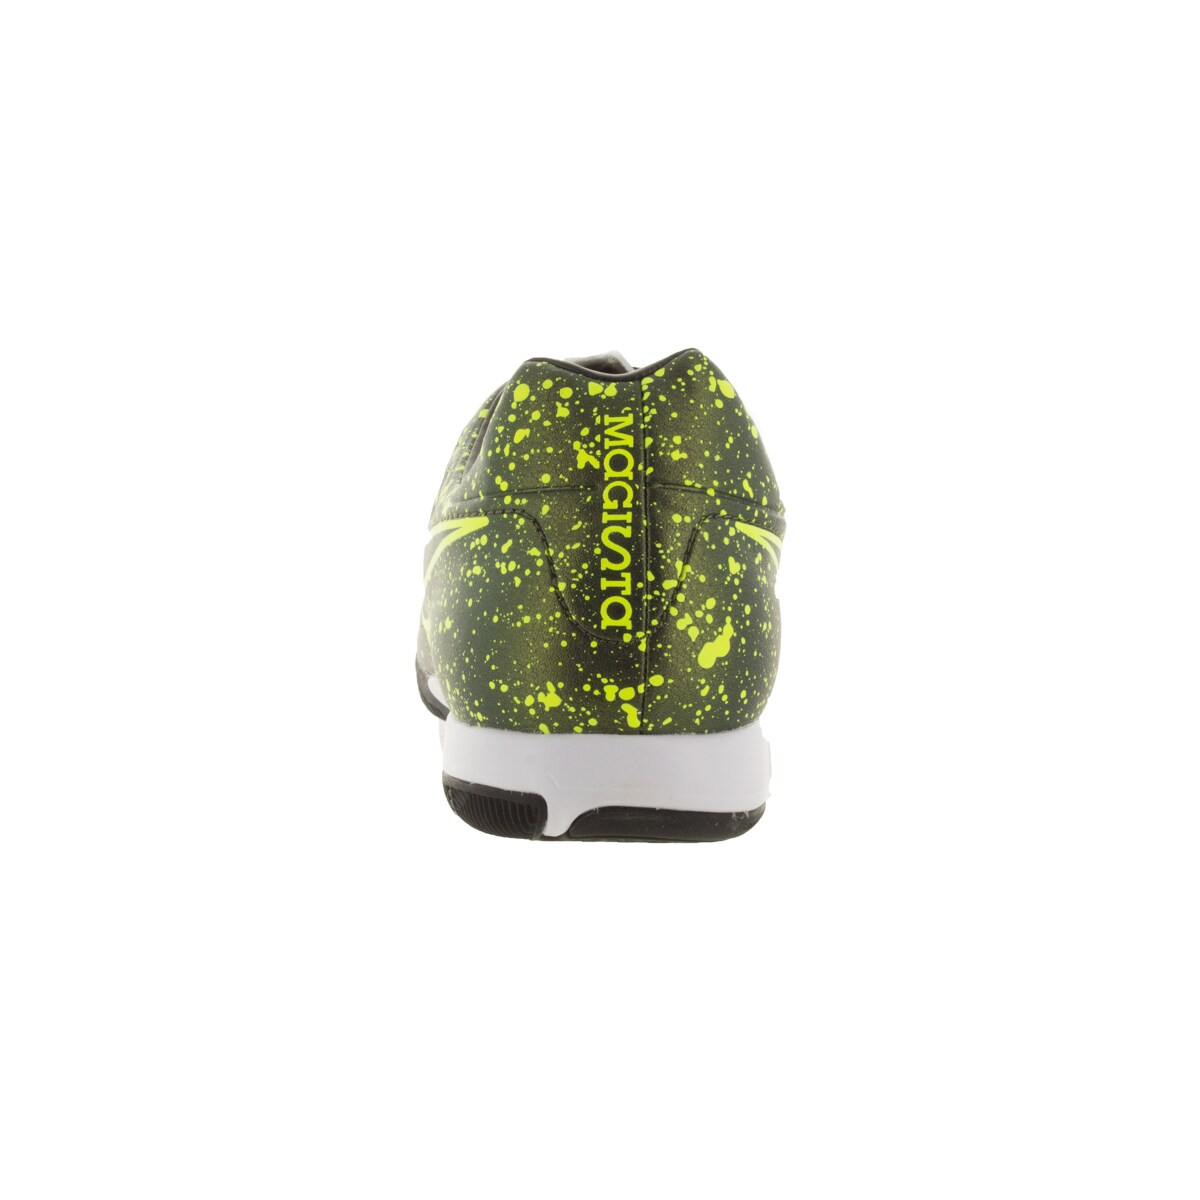 2553b47dc Shop Nike Men s Magista Onda Dark Citron Black Volt Indoor Soccer Cleats -  Free Shipping Today - Overstock - 12115019